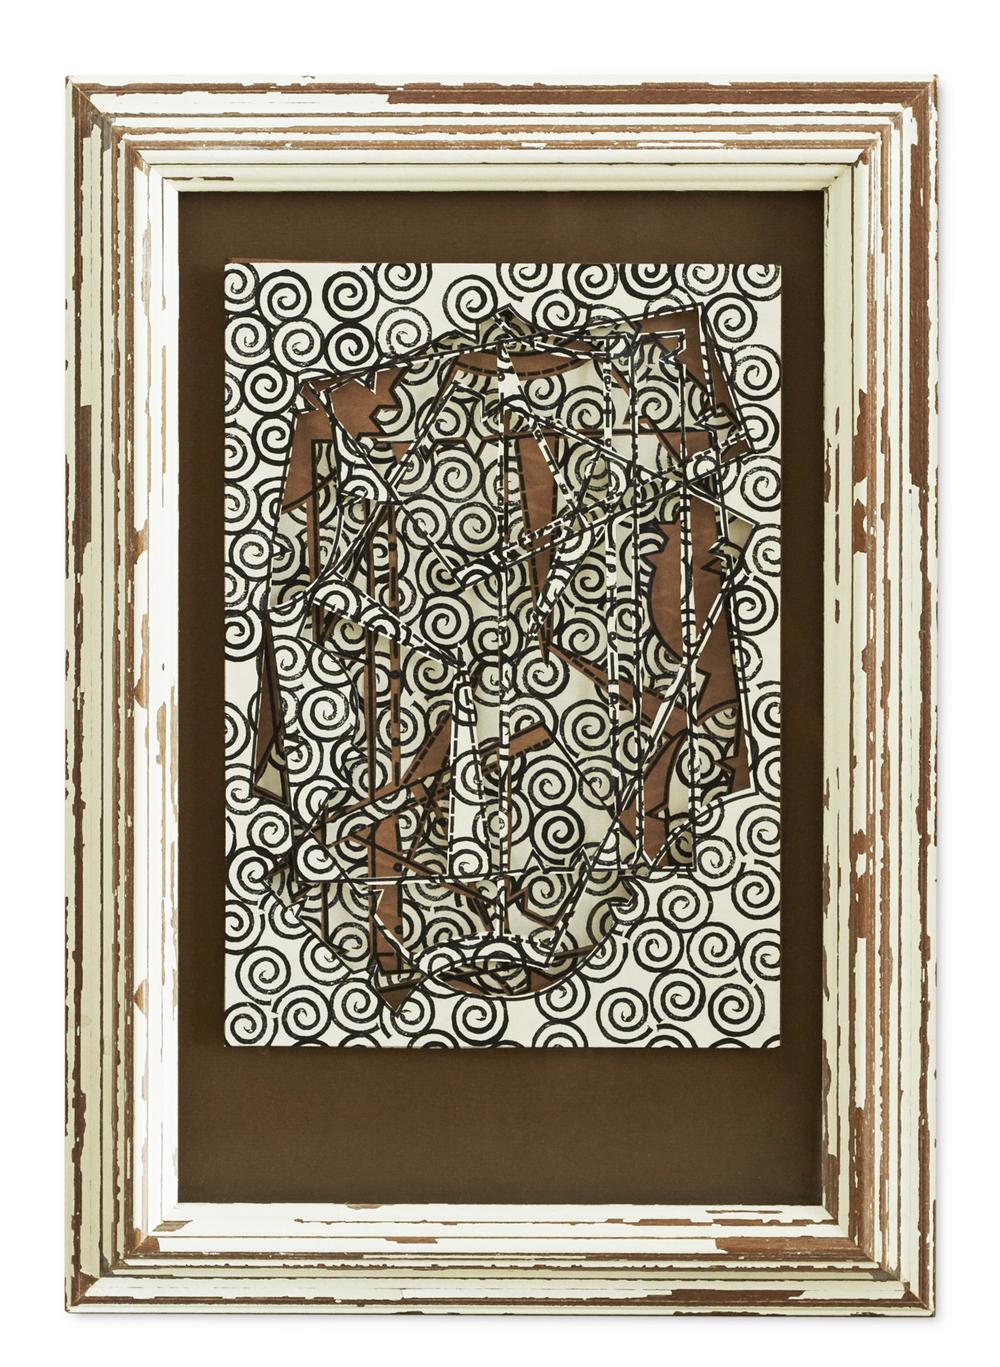 Paper Cuts ,  2015  47.3 x 33.2 cm (framed)£1200